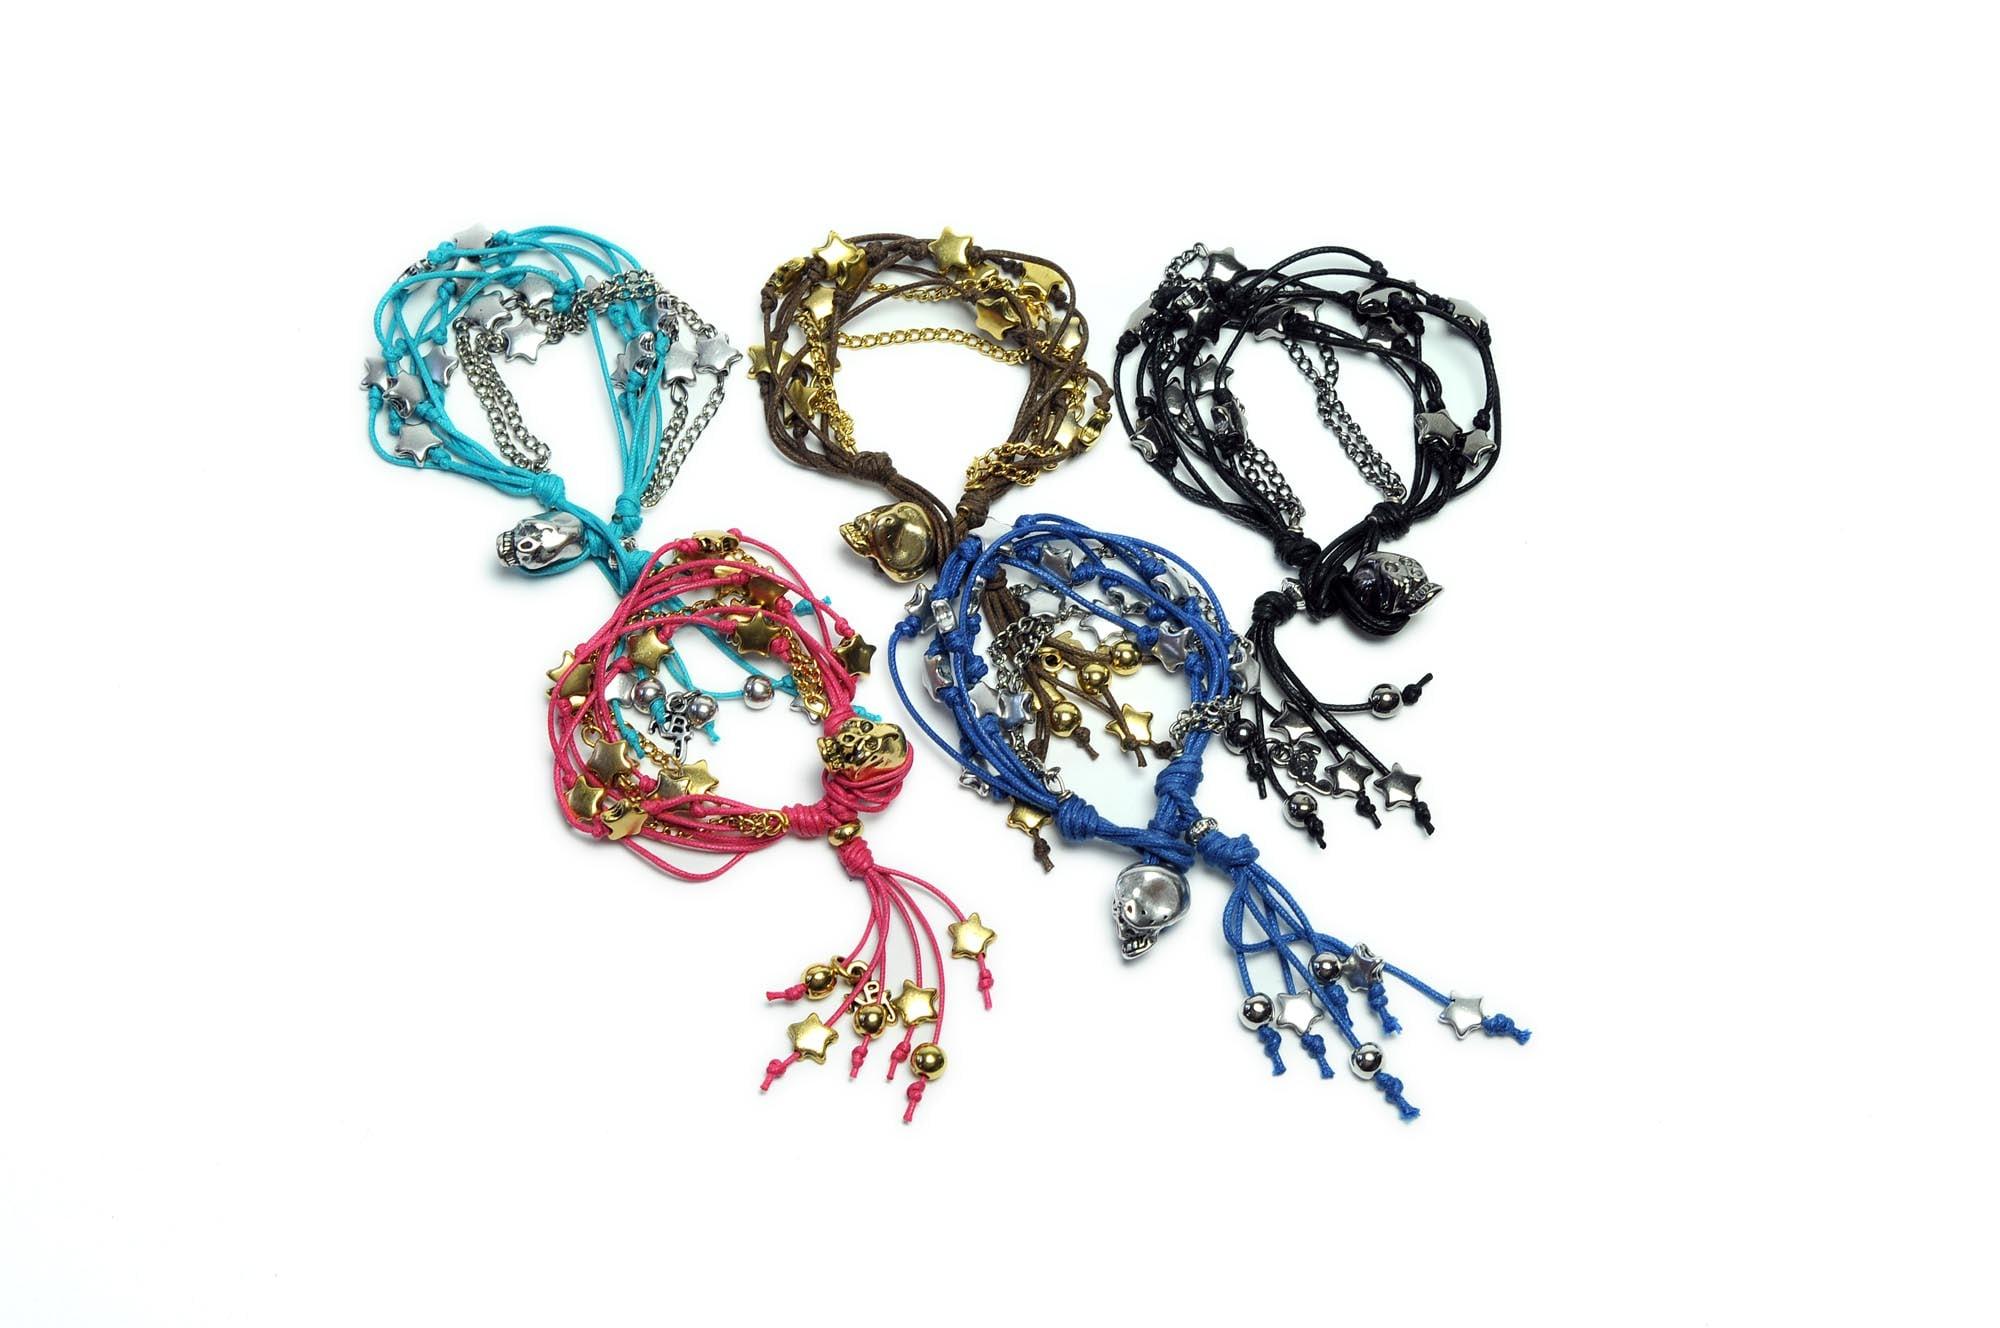 Kattlebell Jewels